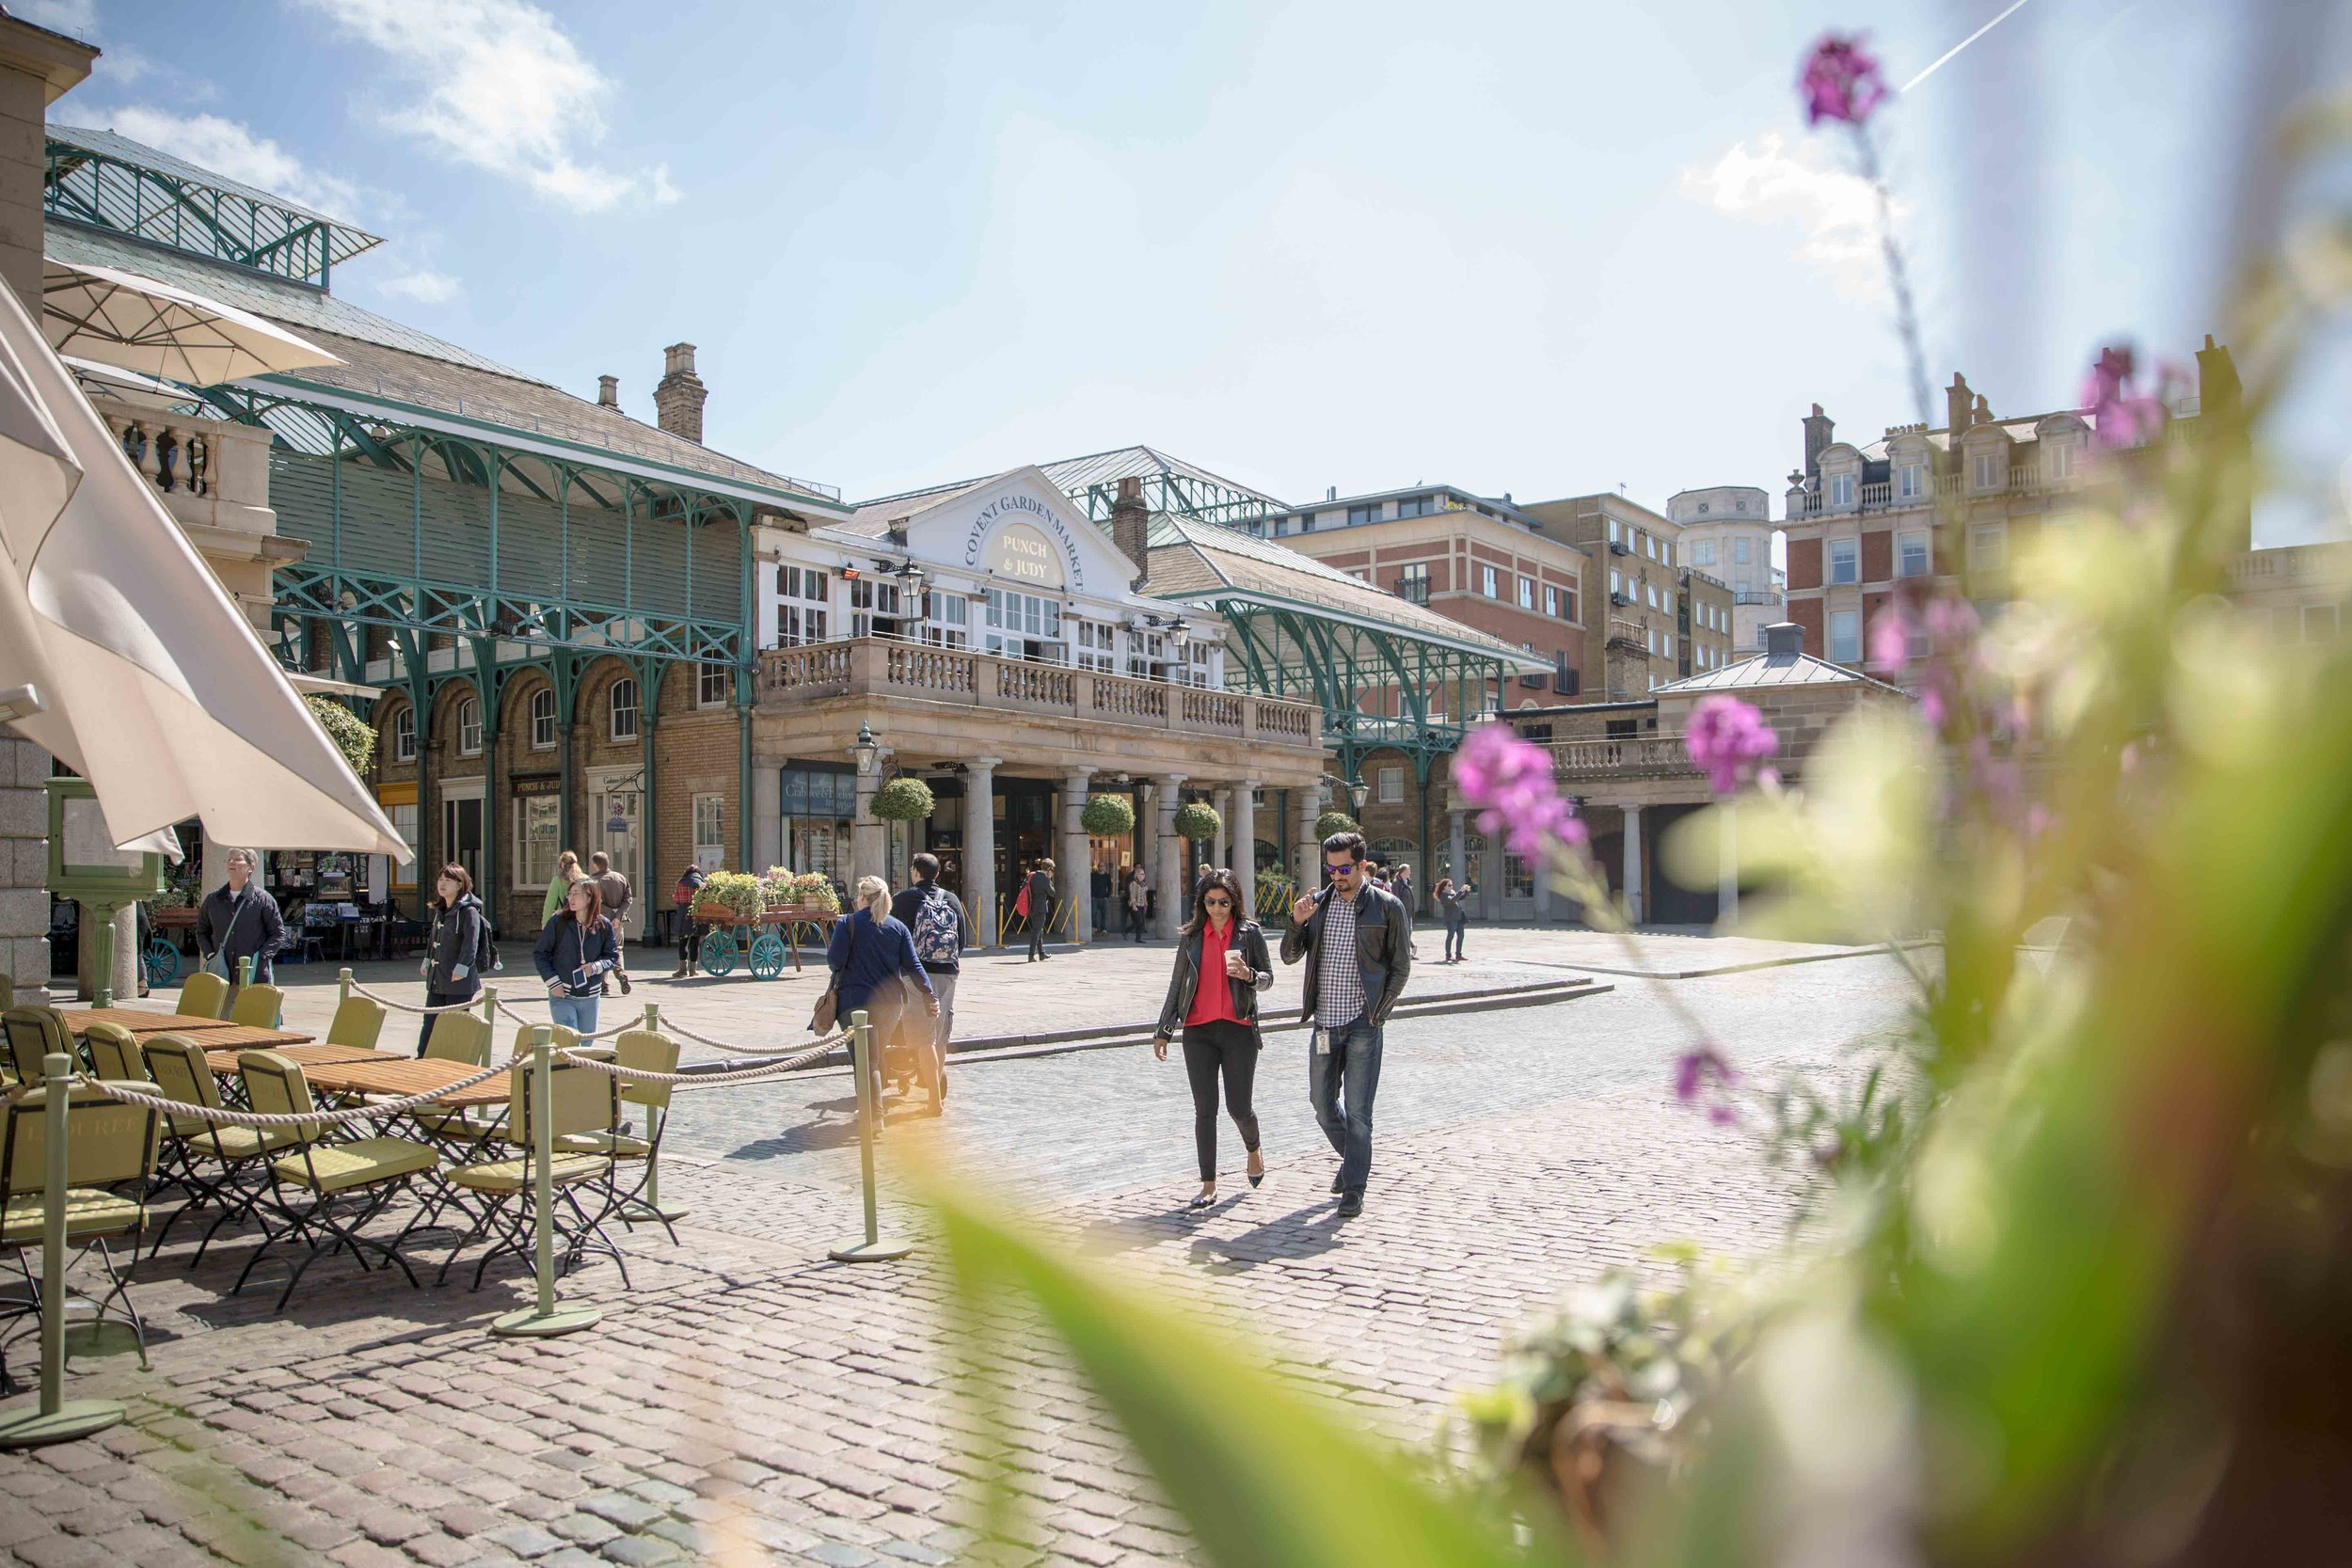 JCTP0104-Covent Garden-London-UK-mcconaghy-19.jpg